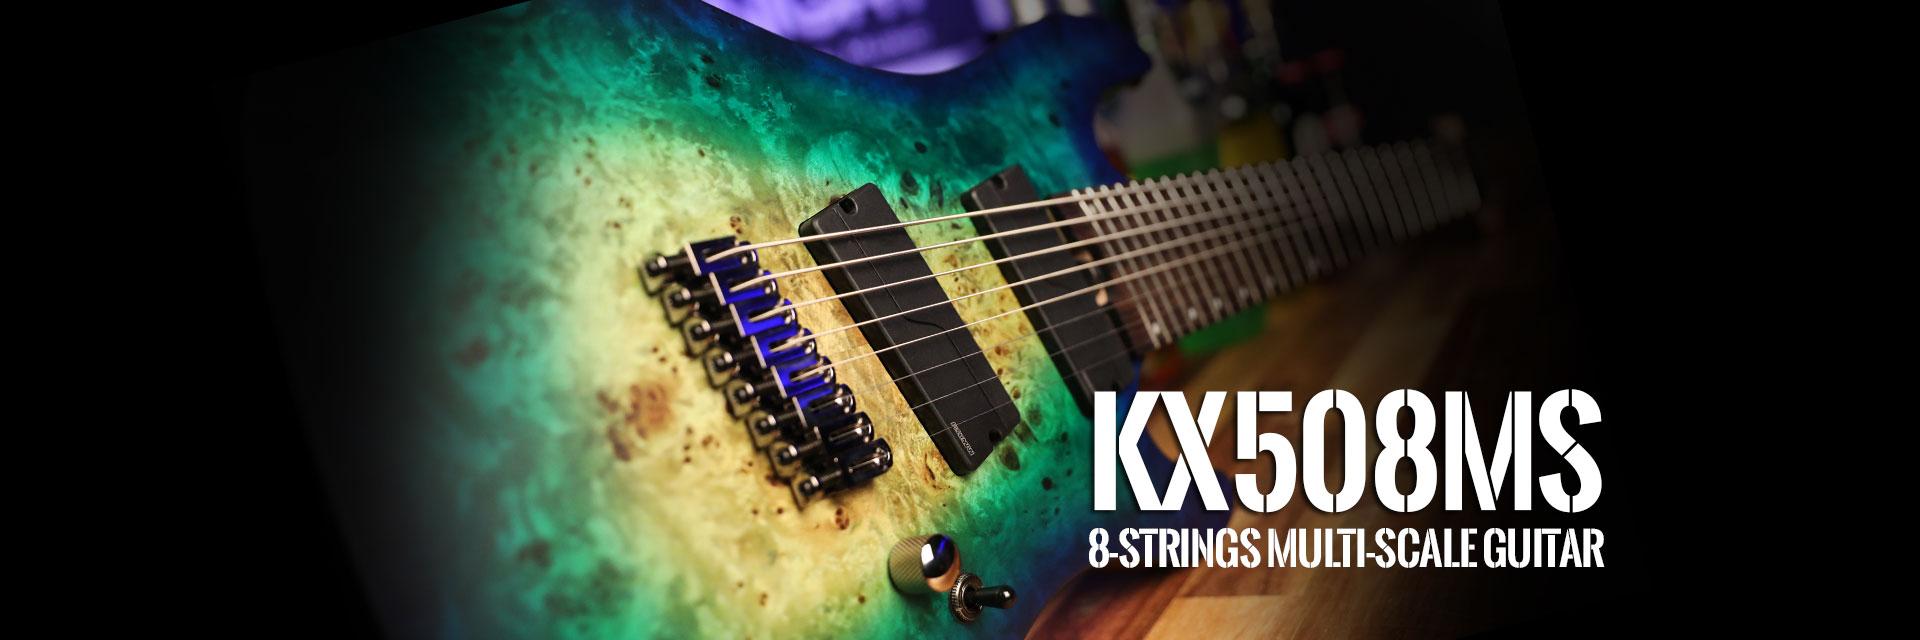 KX508MS